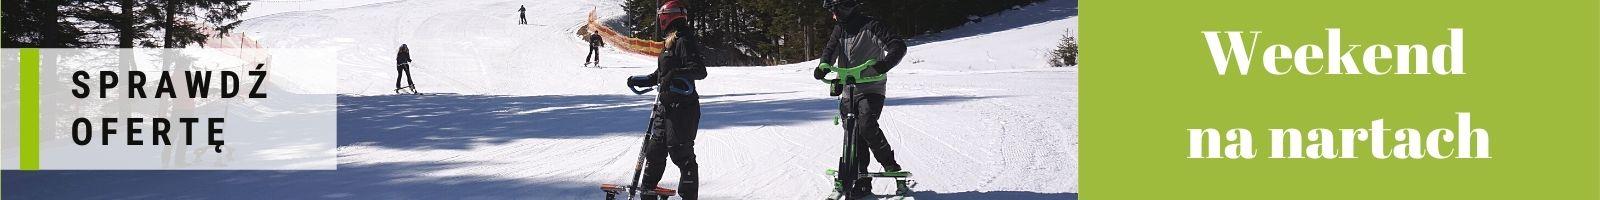 Weekend na nartach